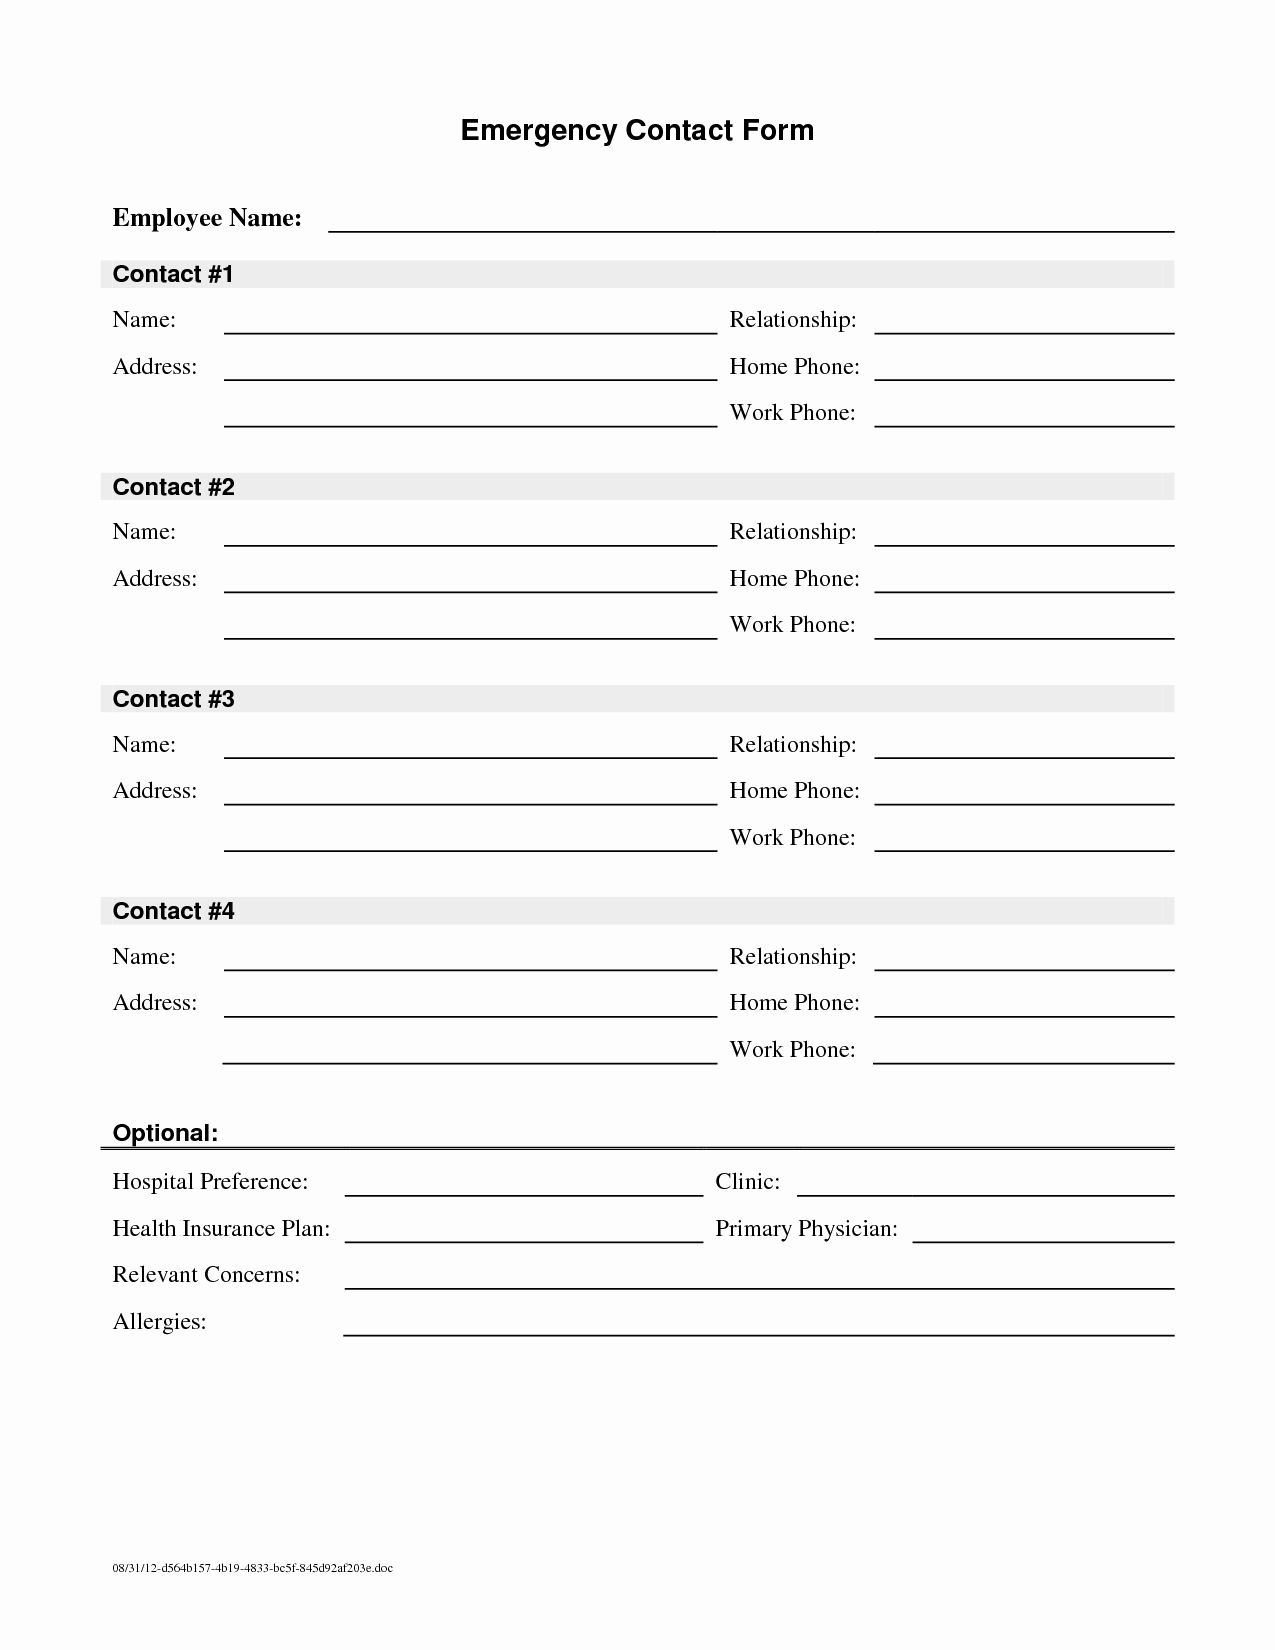 Employment Emergency Contact form Unique Employee Emergency Contact Printable form to Pin